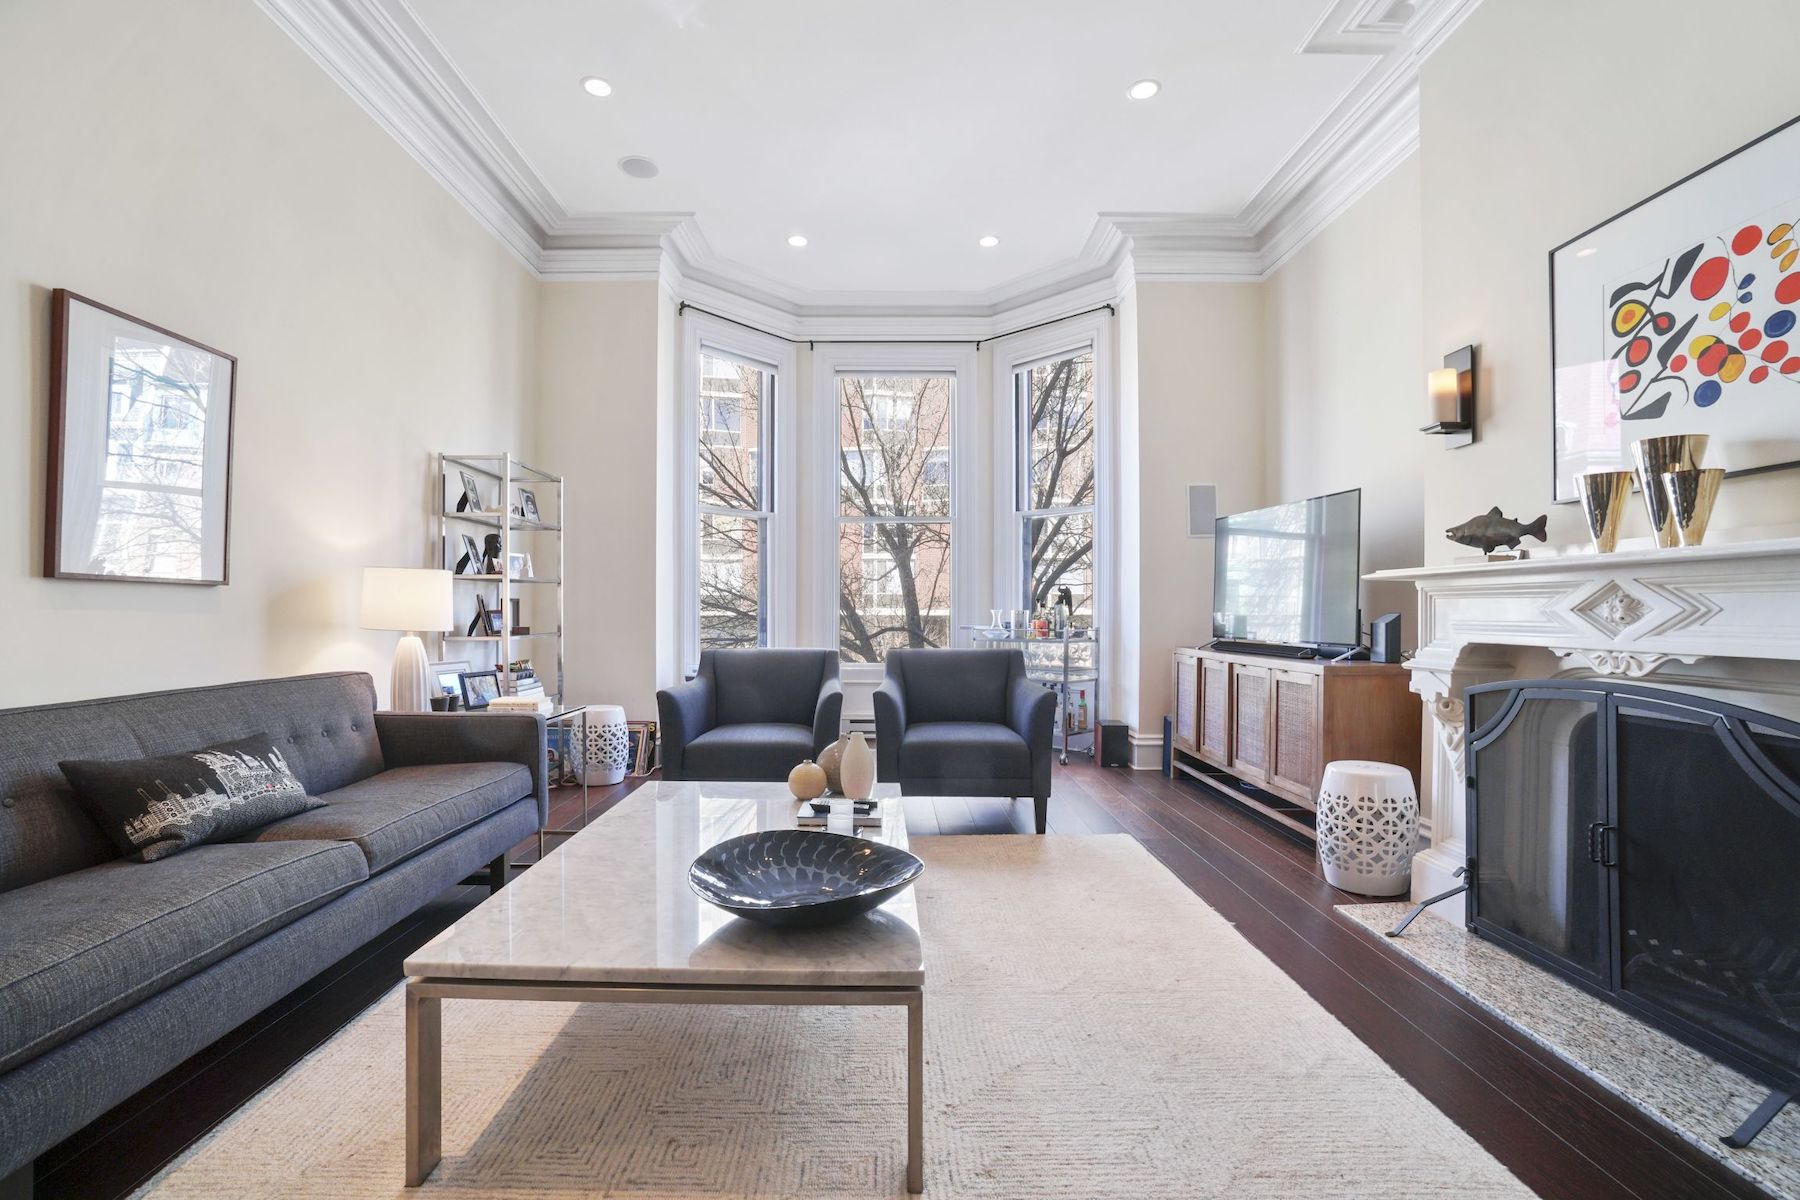 Single Family Homes for Sale at 345 Beacon Street Boston, Massachusetts 02116 United States